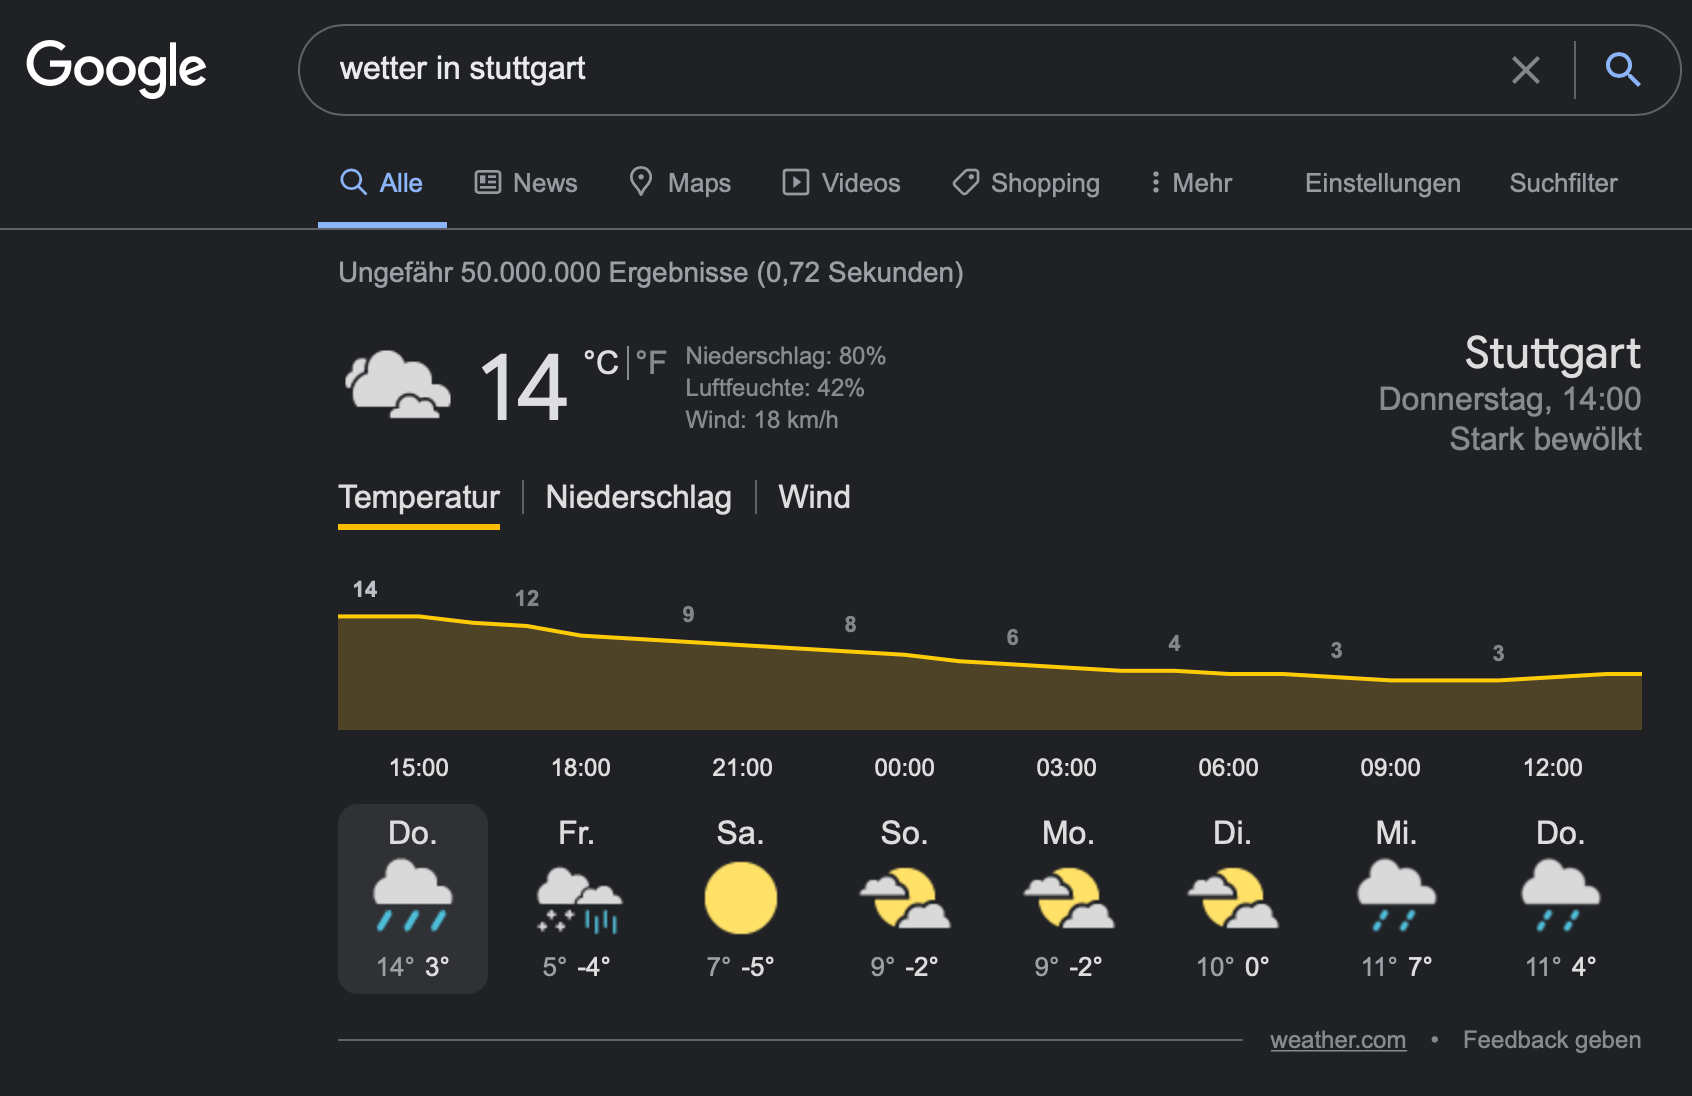 """Wetter in Stuttgart"" bei Google"